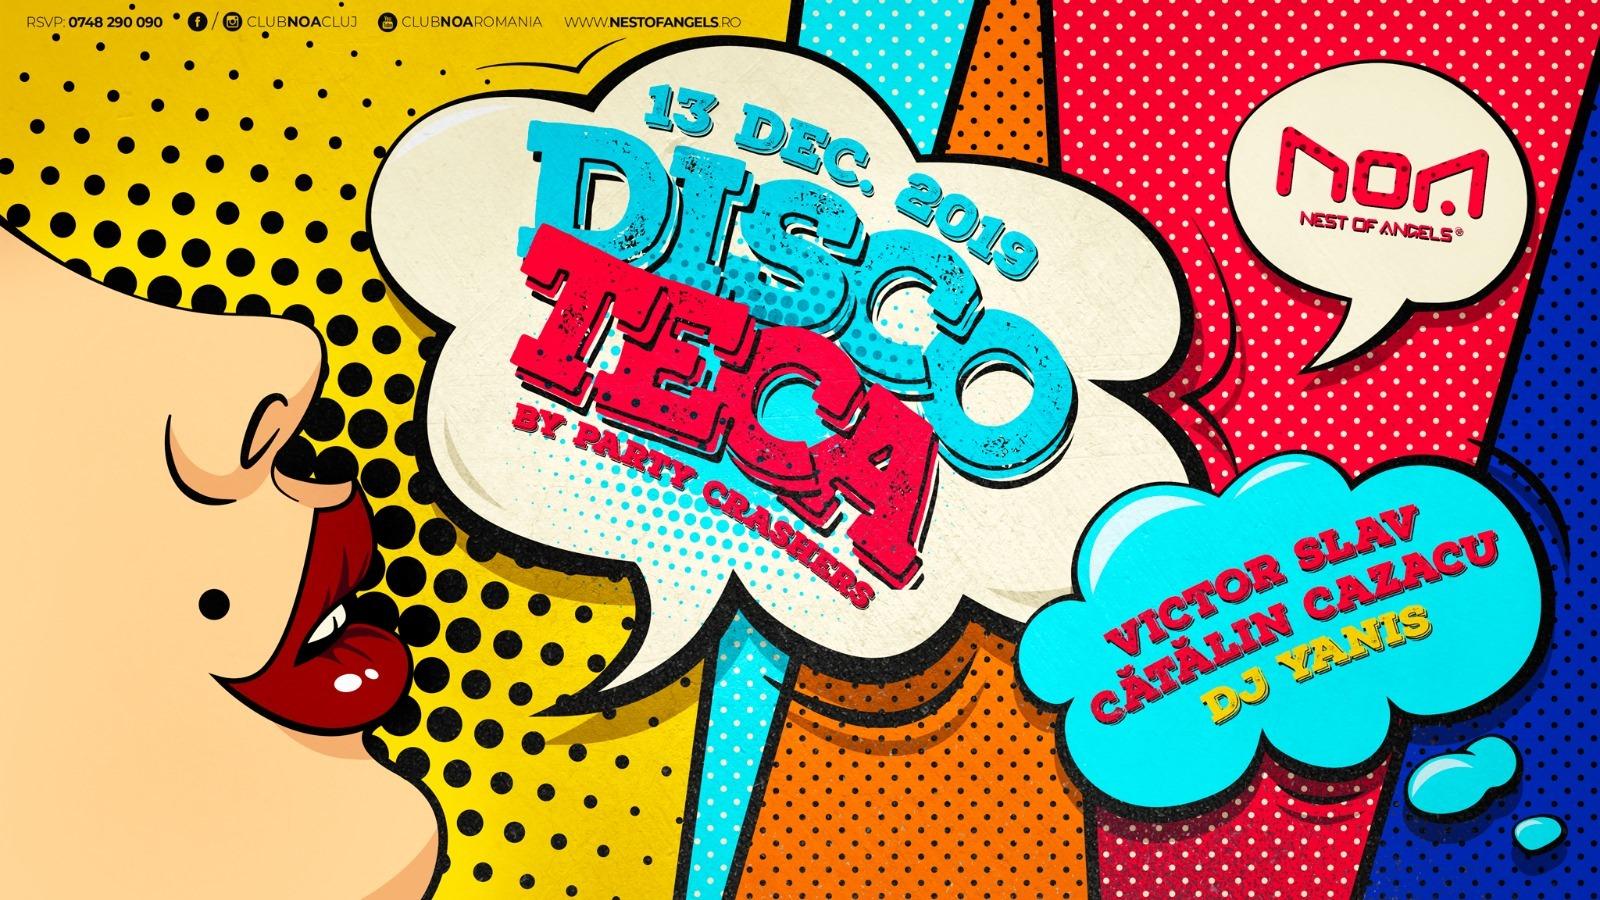 Discoteca by Party Crashers @ Club Noa